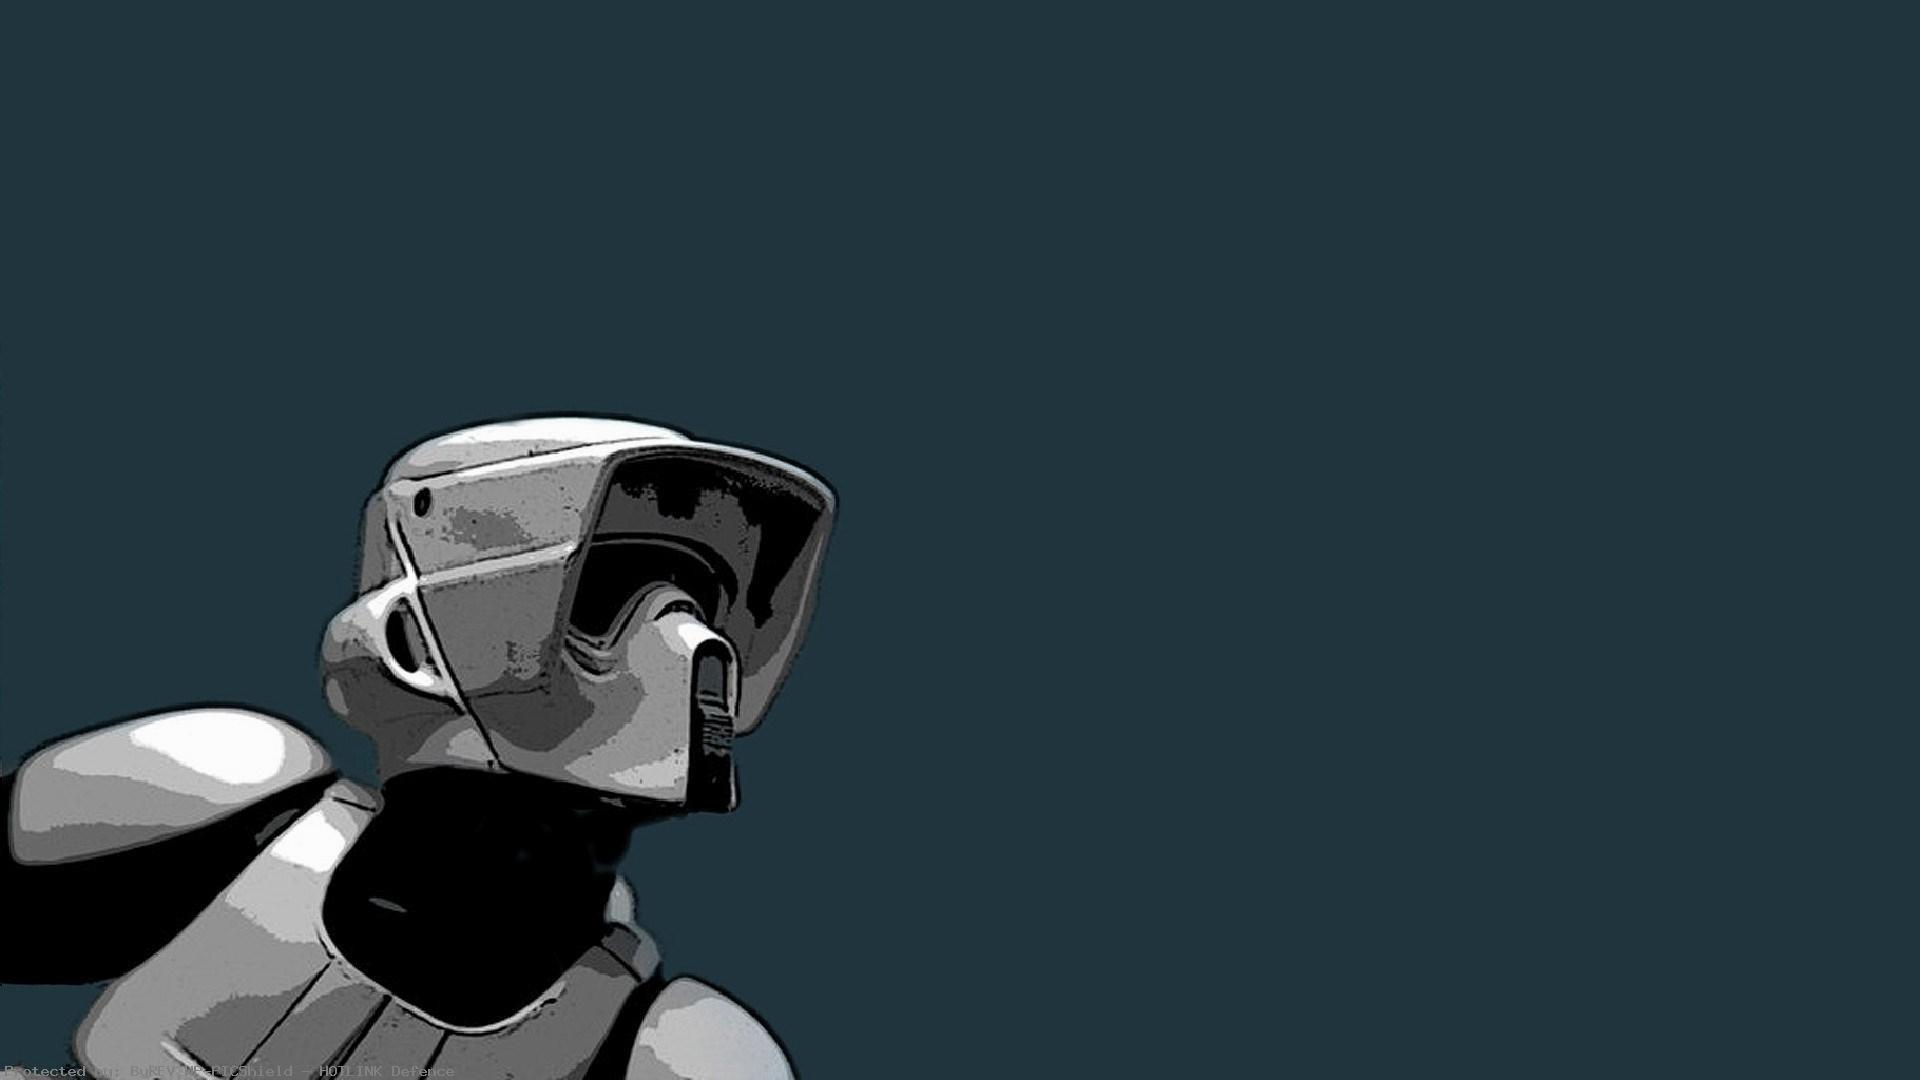 star-wars-free-desktop-wallpaper-wp4208327